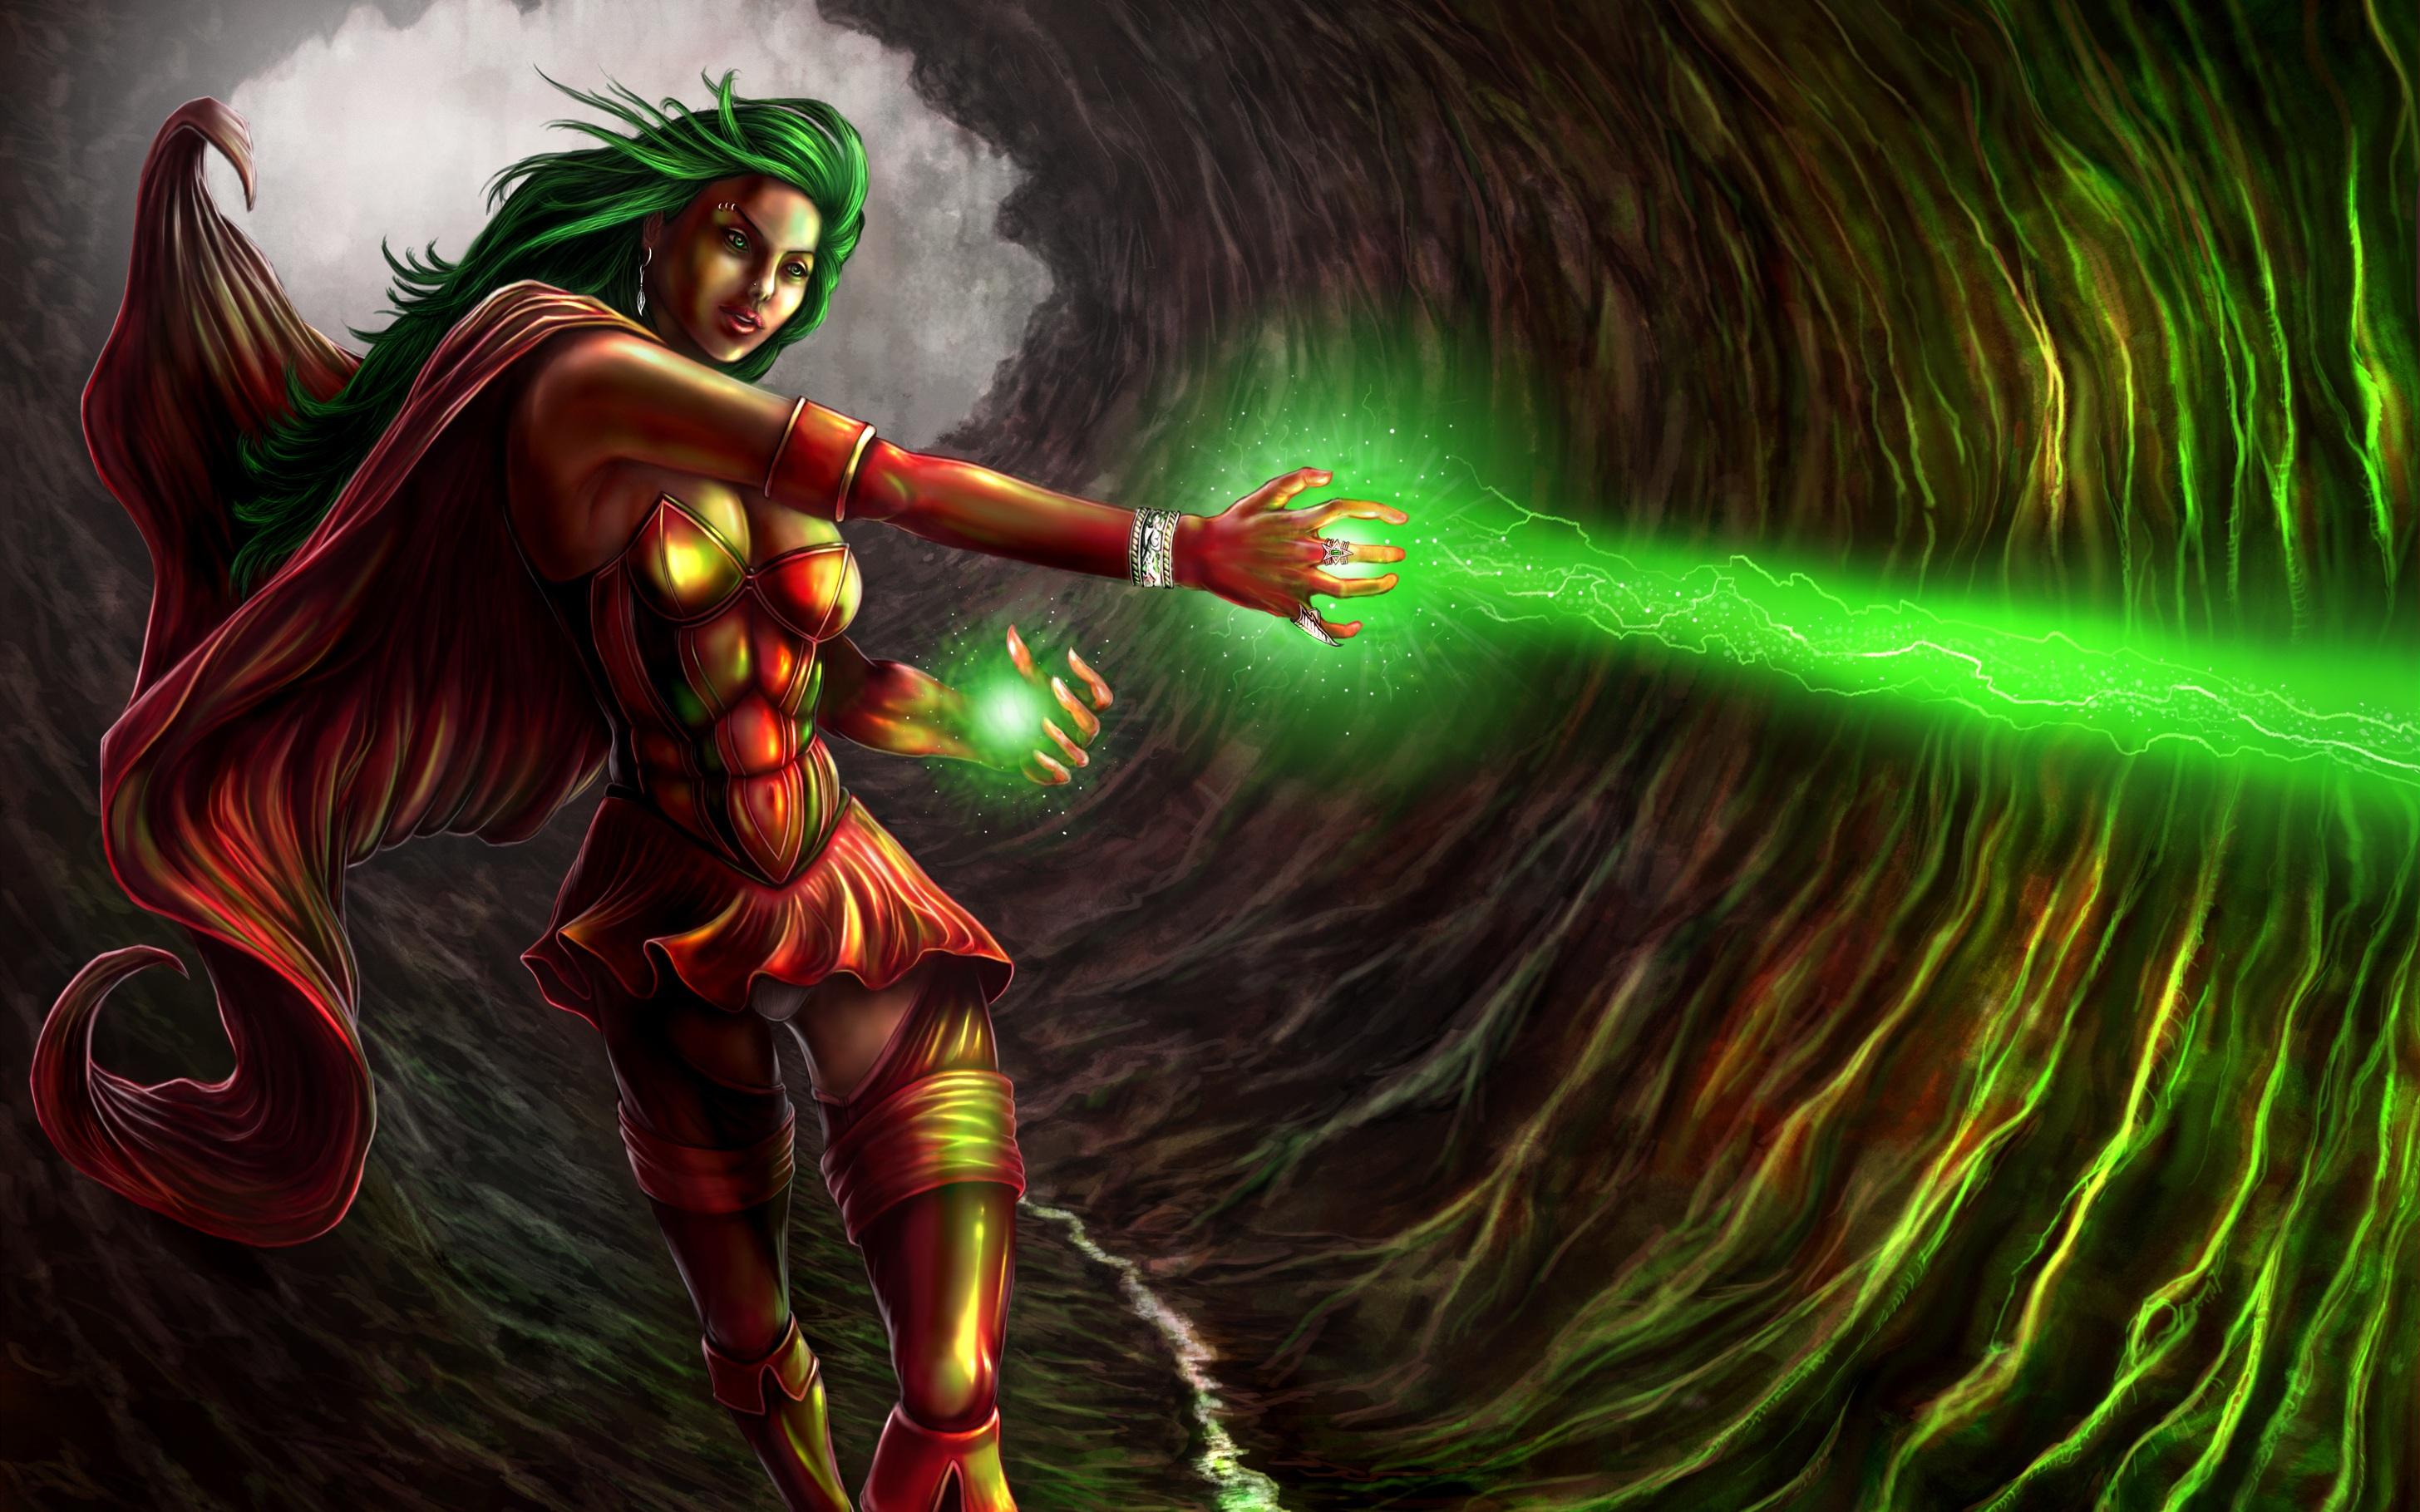 Magic Wallpaper Iphone X Girl With Green Hair Woman Warrior Green Magic Fantasy